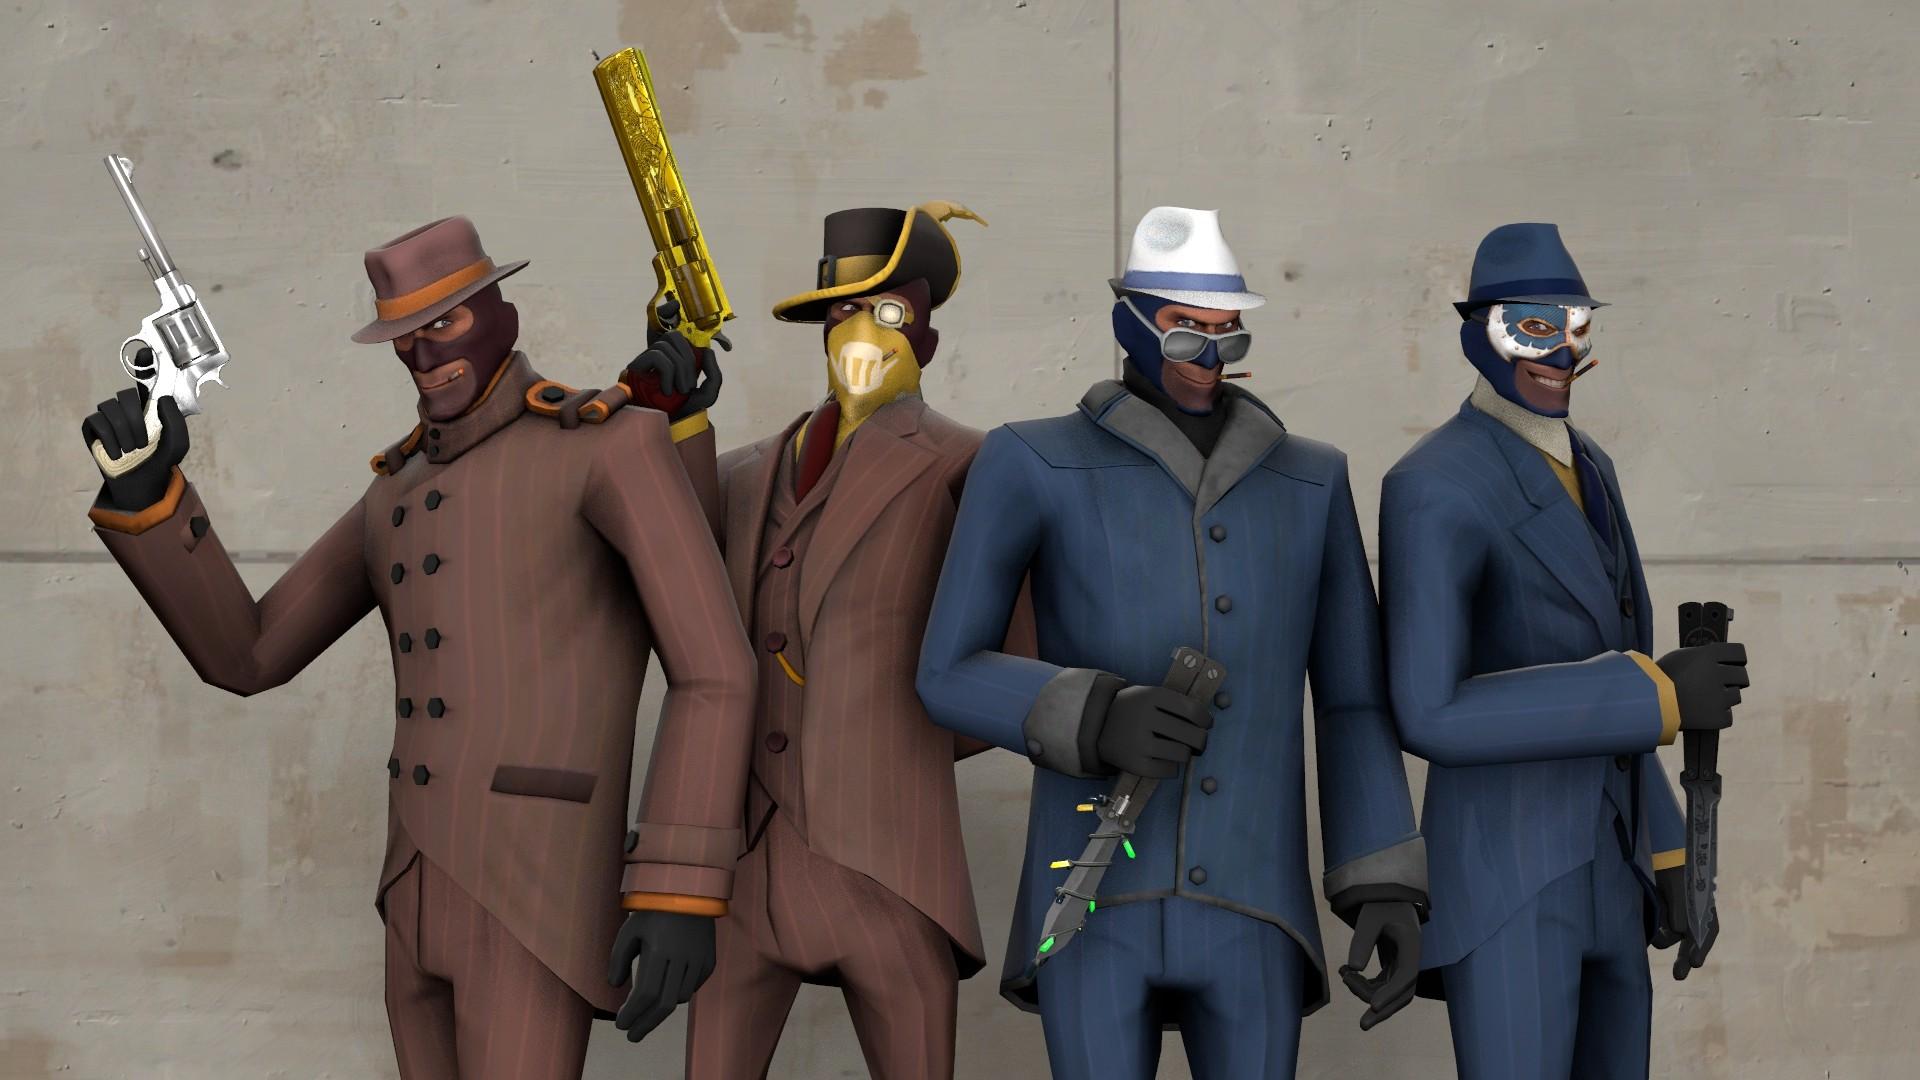 Meet the spies tf2 wallpaper hd download.